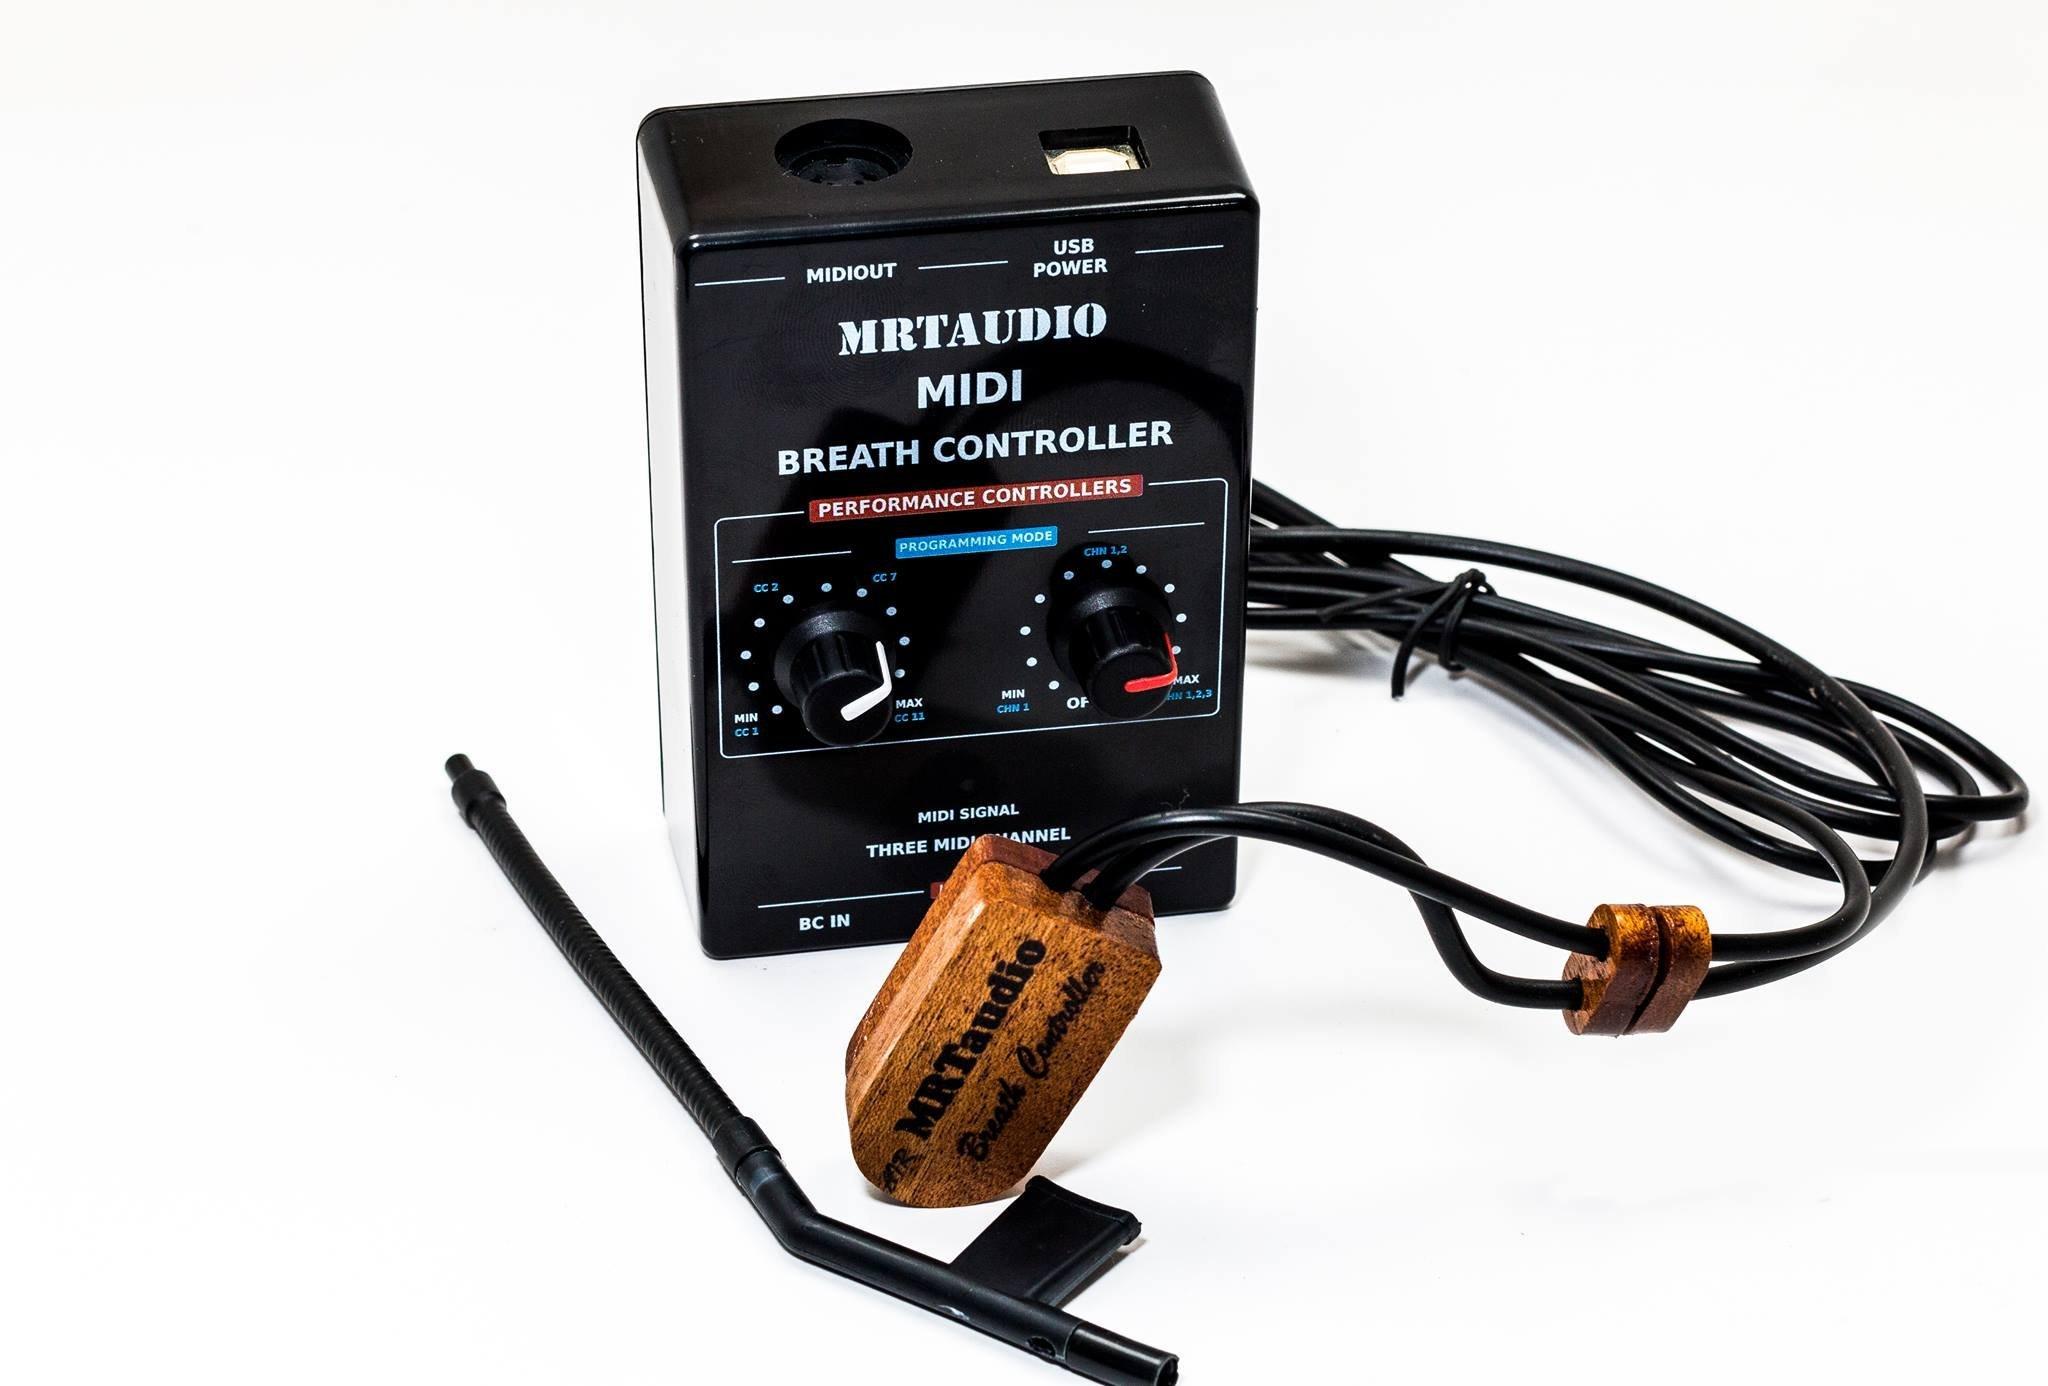 Mrtaudio Midi Breath Controller v2 for Yamaha bc3a by Mrtaudio (Image #6)